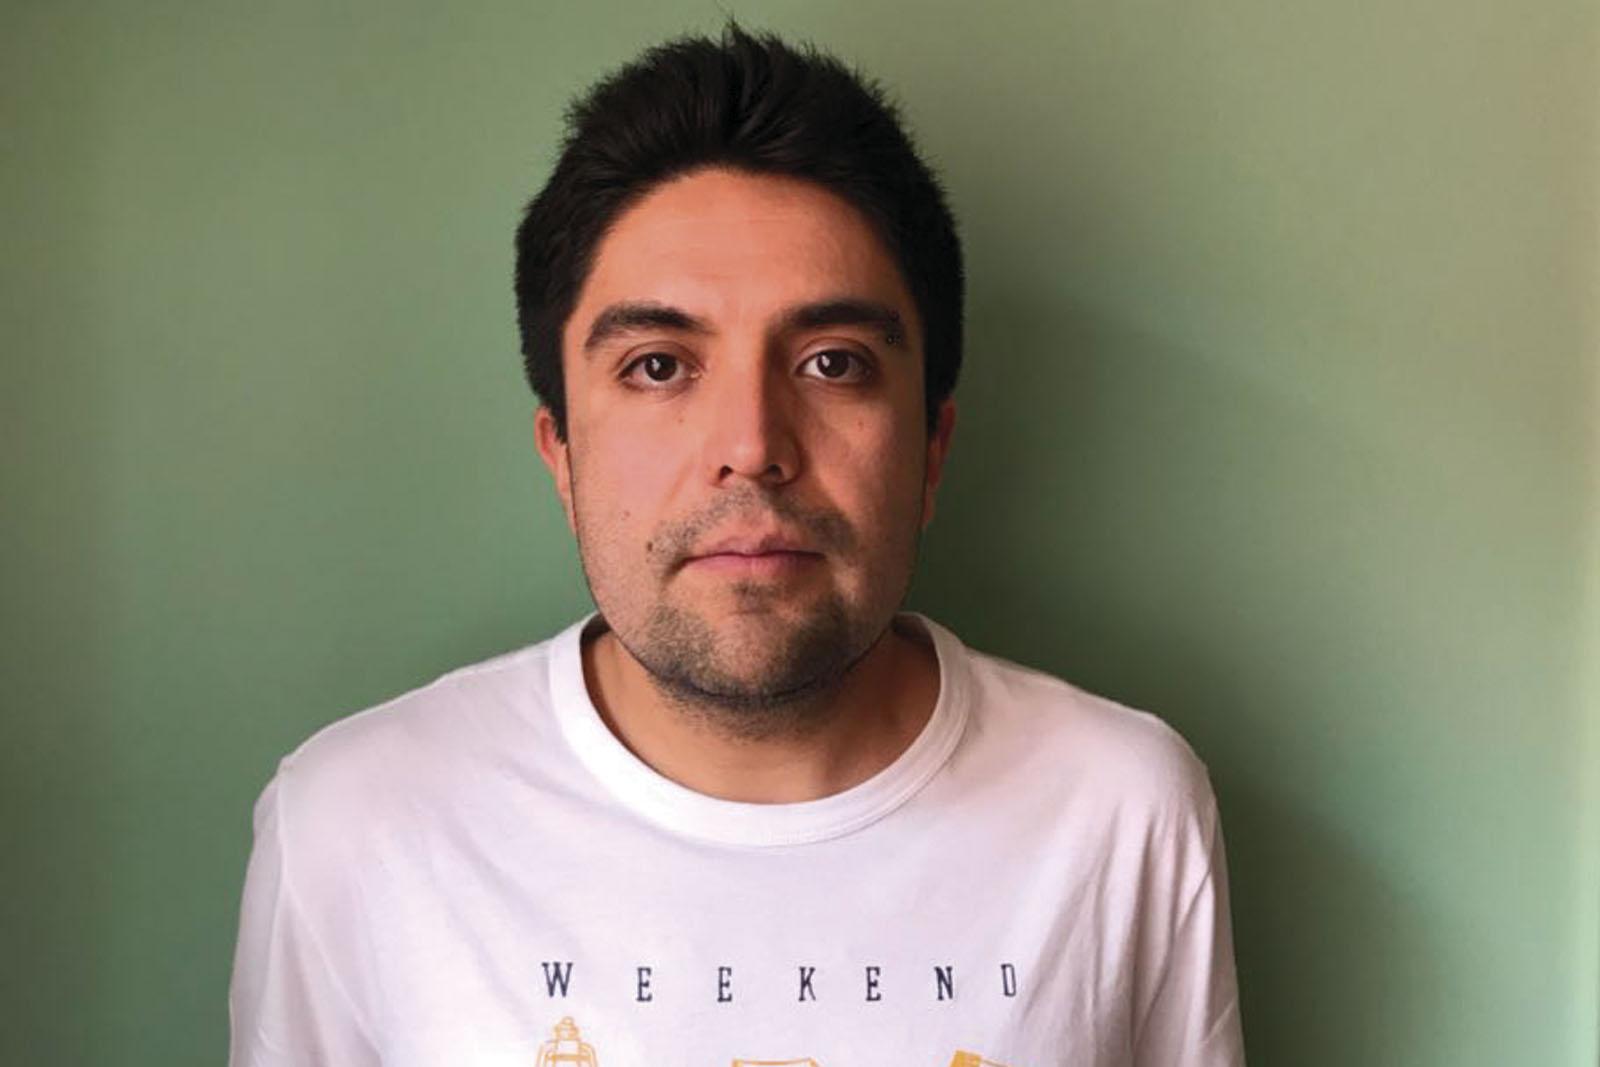 soy Roger, Rogelio Cejudo, Informática, Marketing, emprendedor